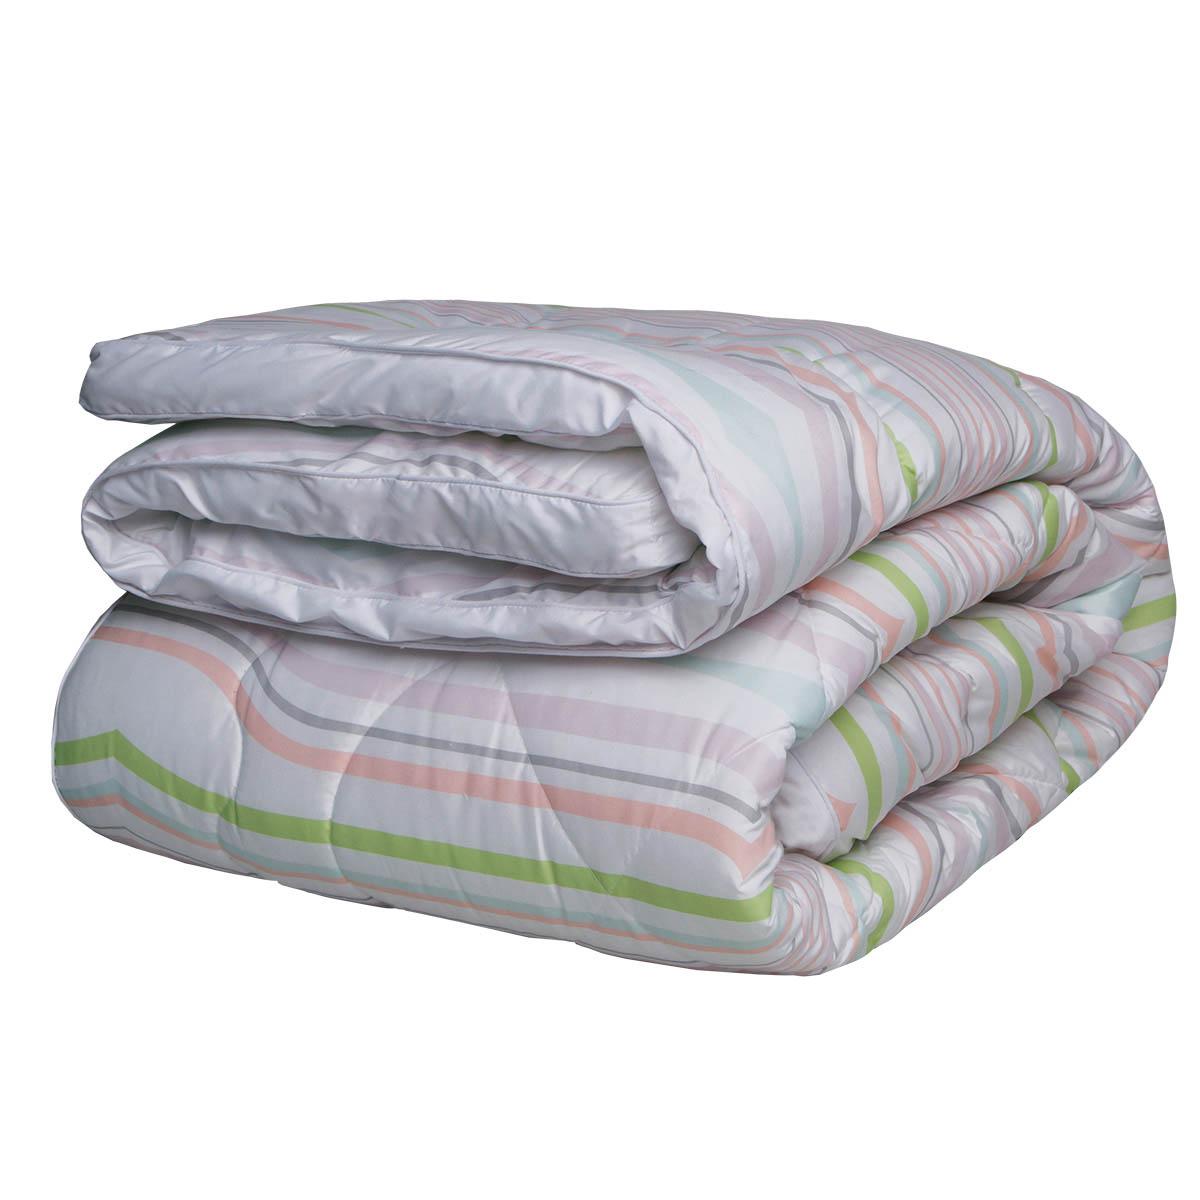 Одеяла Mona Liza Одеяло Secret Gardens Всесезонное (140х205 см) одеяло зимнее mona liza микки морячок наполнитель холлофайбер 105 см х 140 см